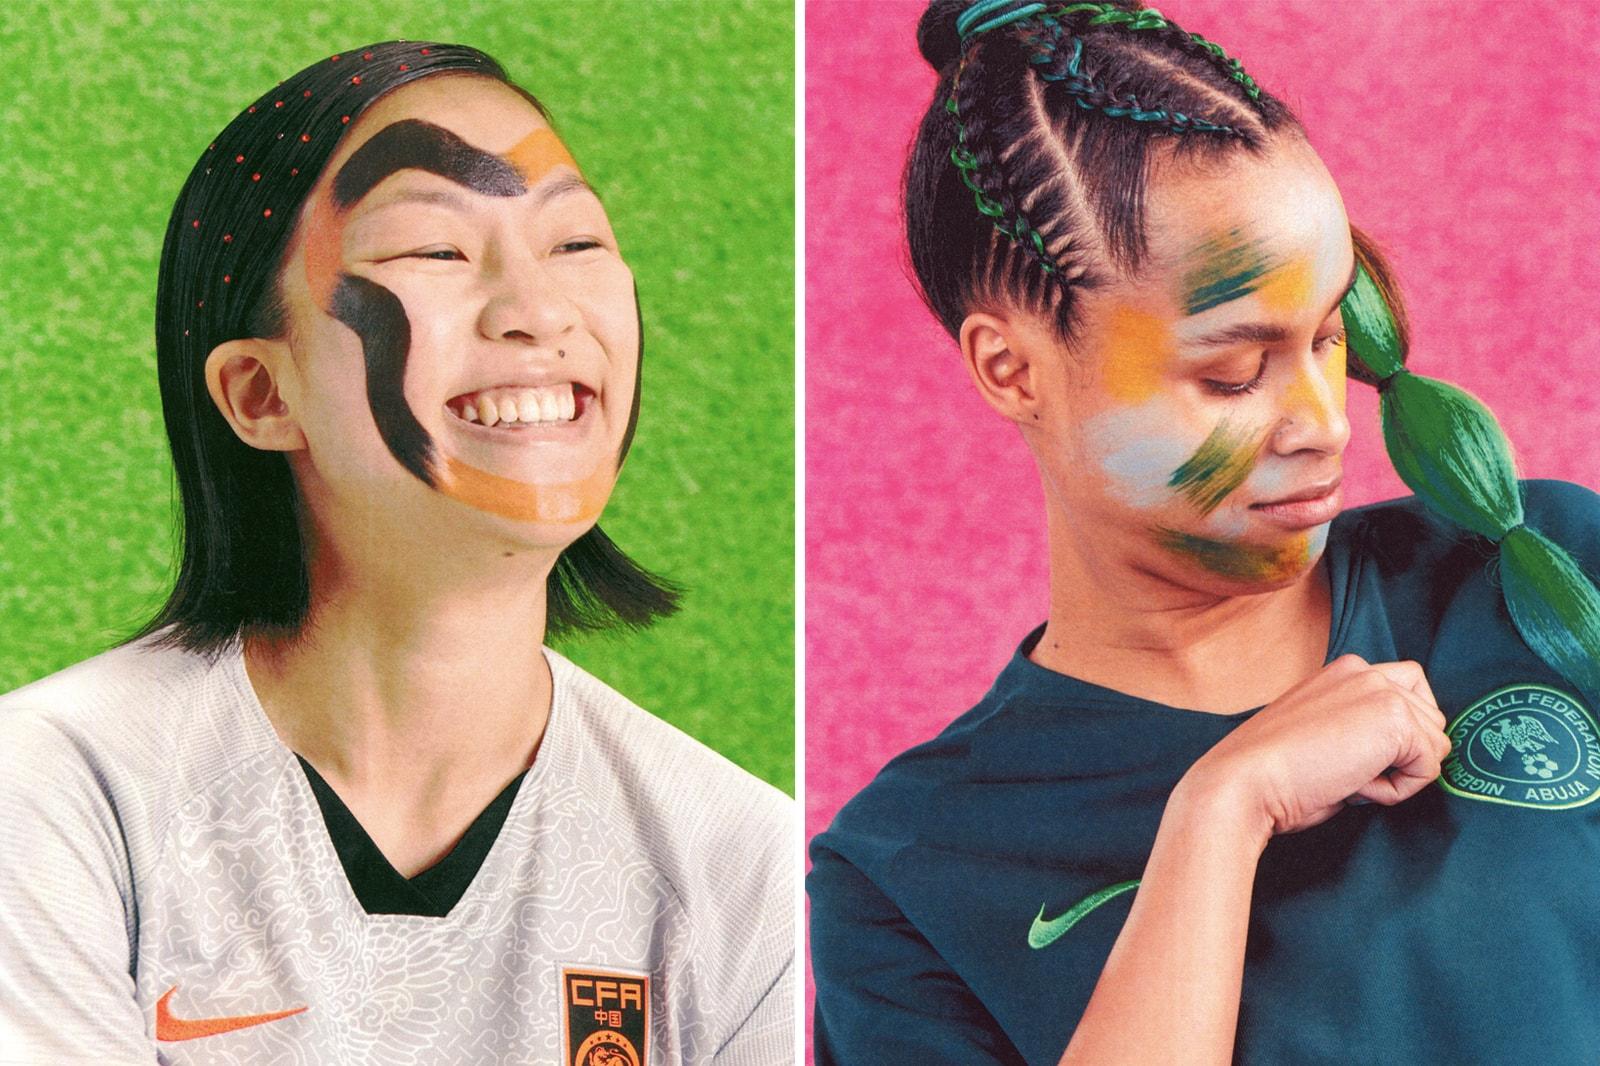 Women's World Cup Nike Football Soccer Kit Jersey Designer Interview Cassie Looker FIFA 2019